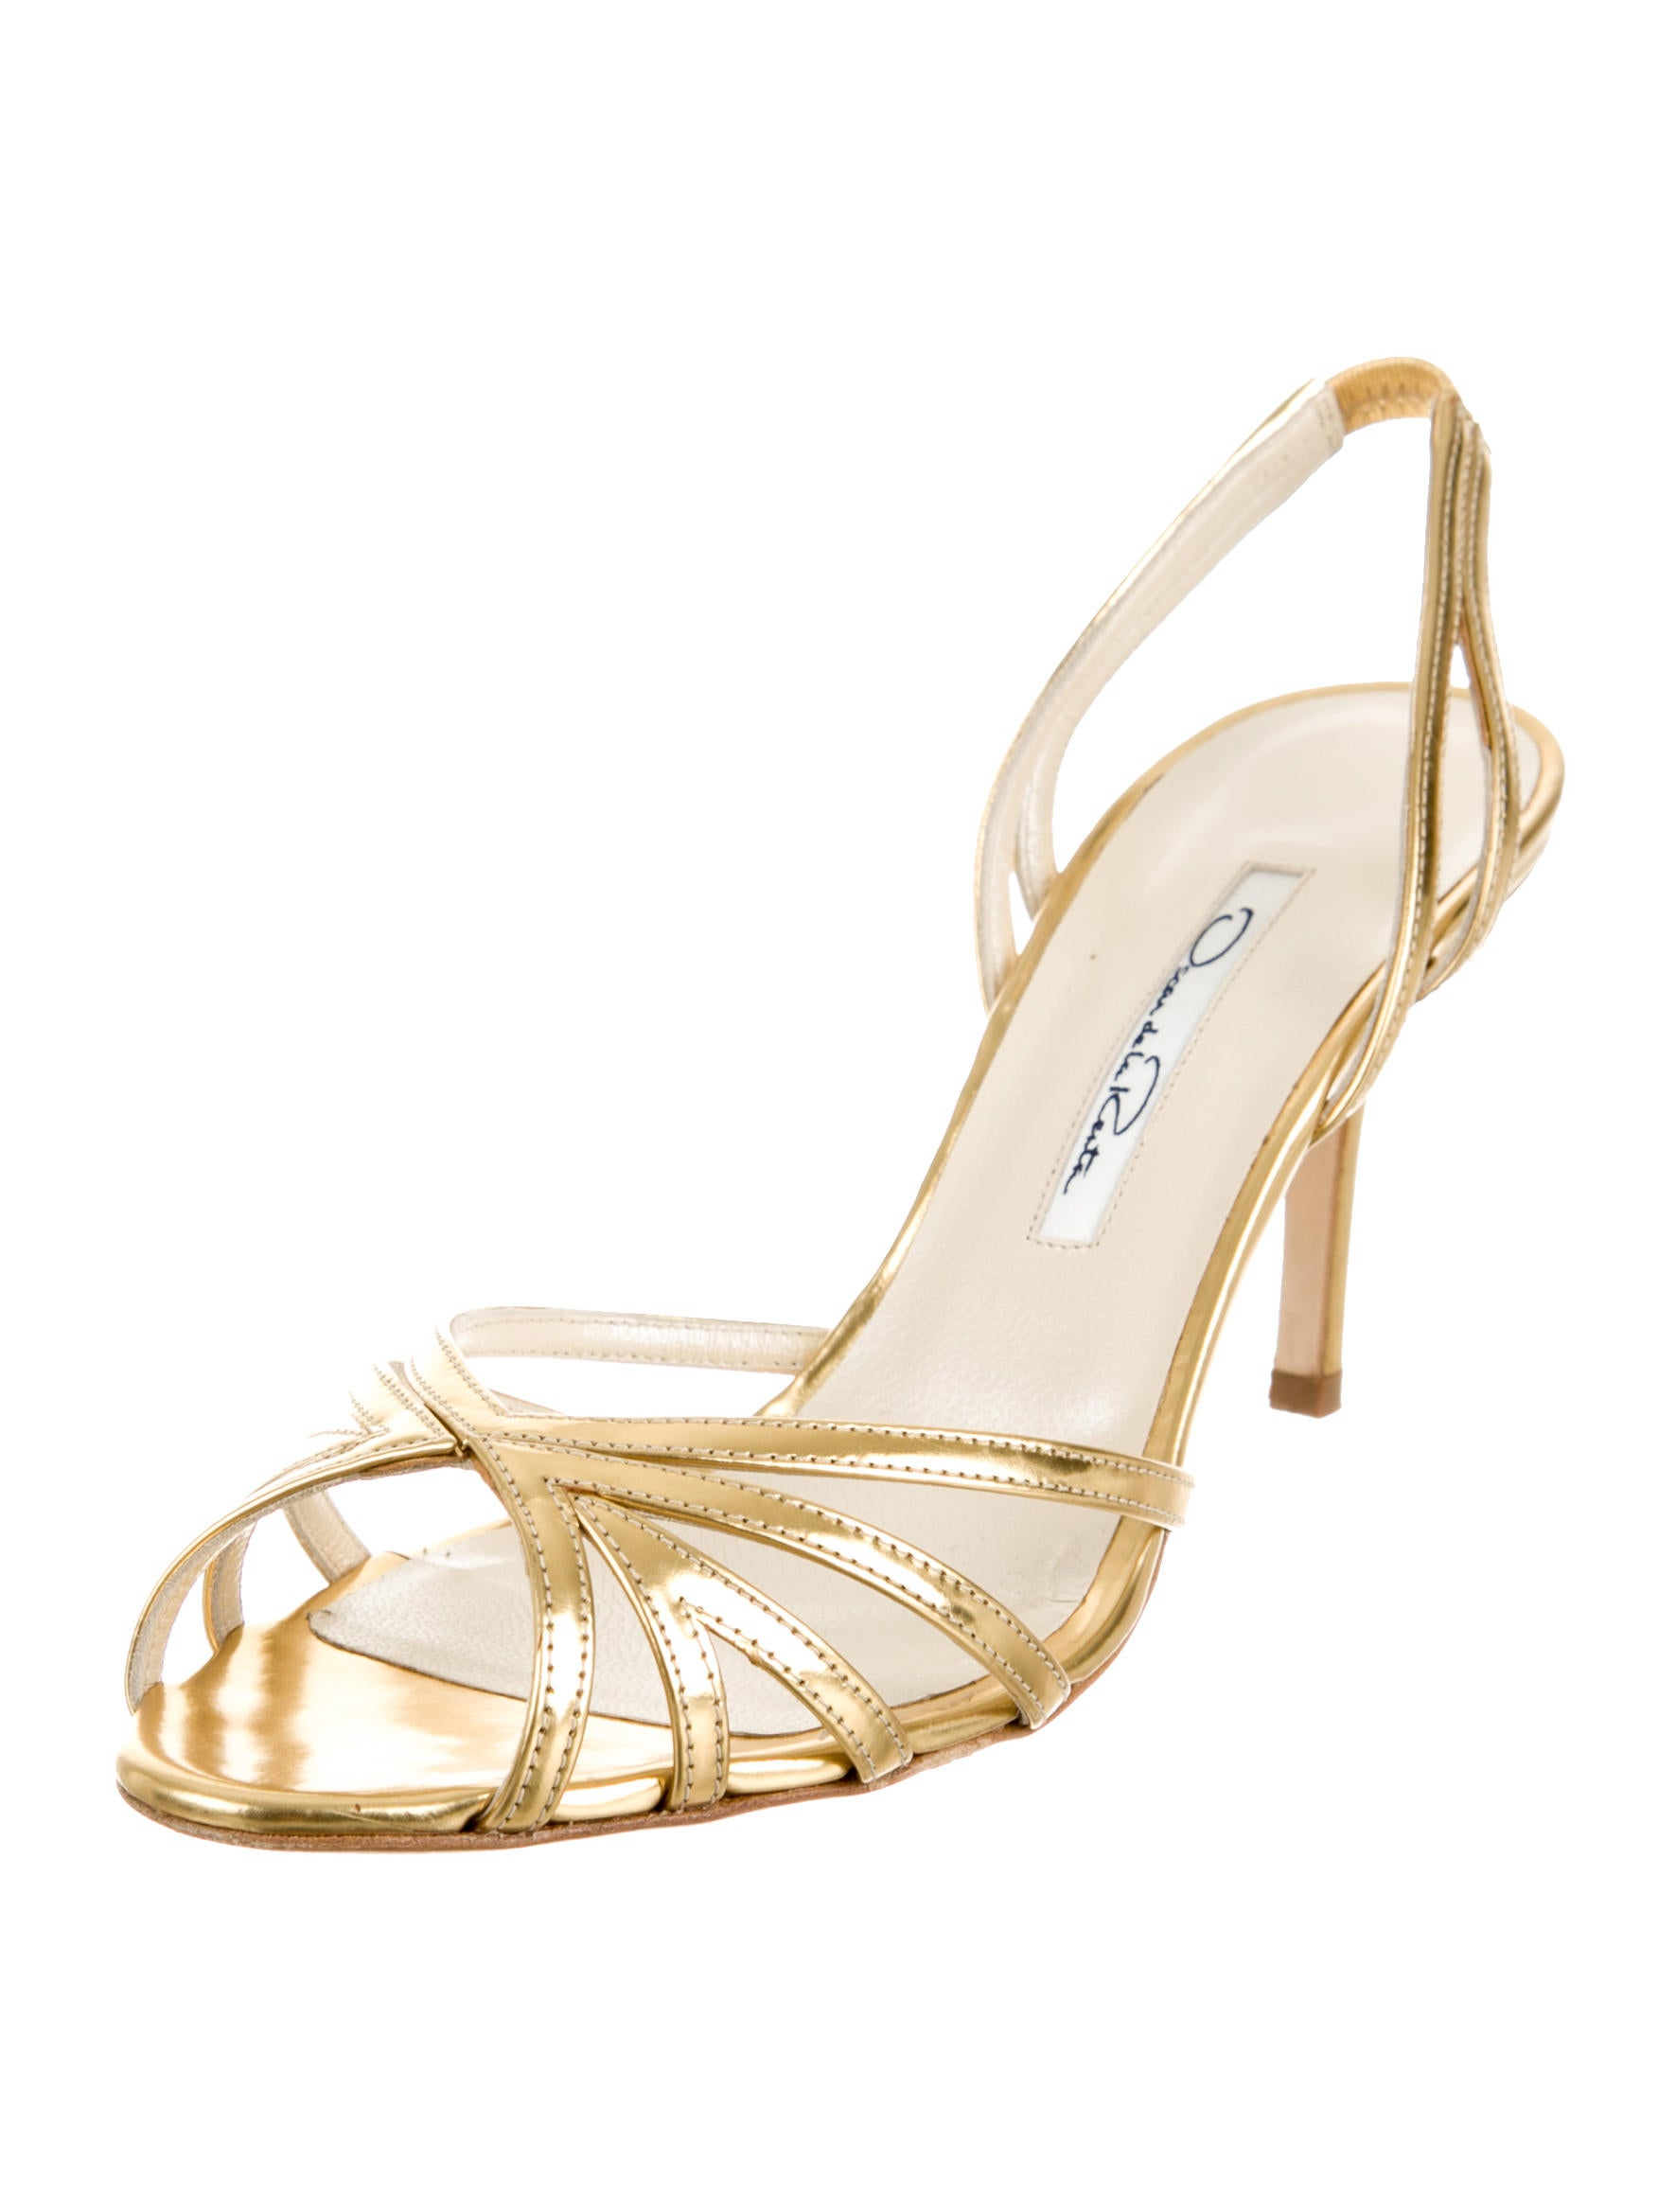 Oscar de la Renta Ramona Slingback Sandals free shipping footaction newest sale professional buy cheap fake 100% original online HULuMj2r8